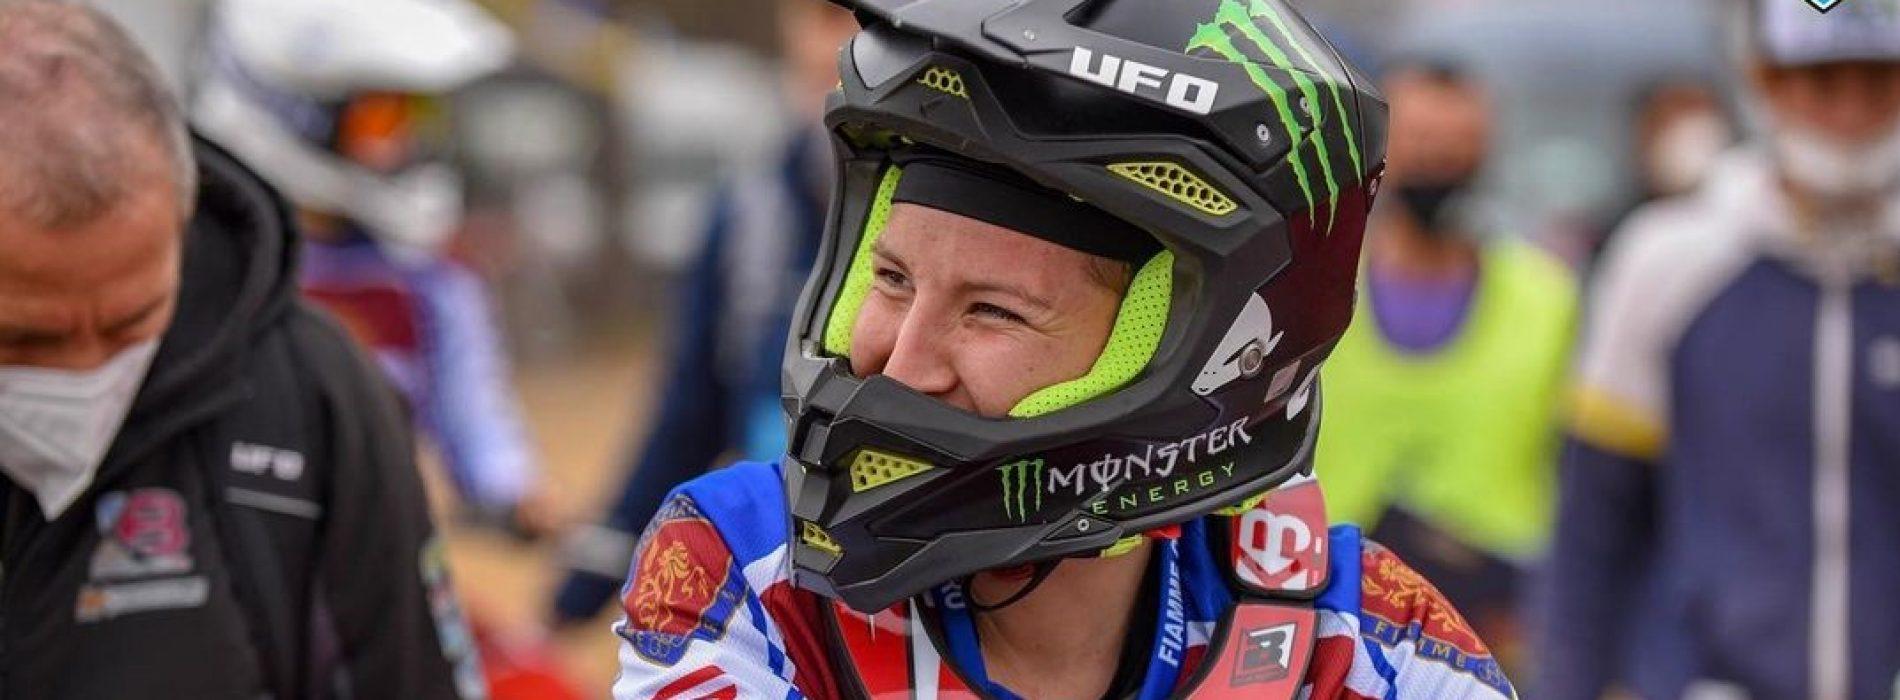 Women's Motocross World Championship 2021- Kiara Fontanesi